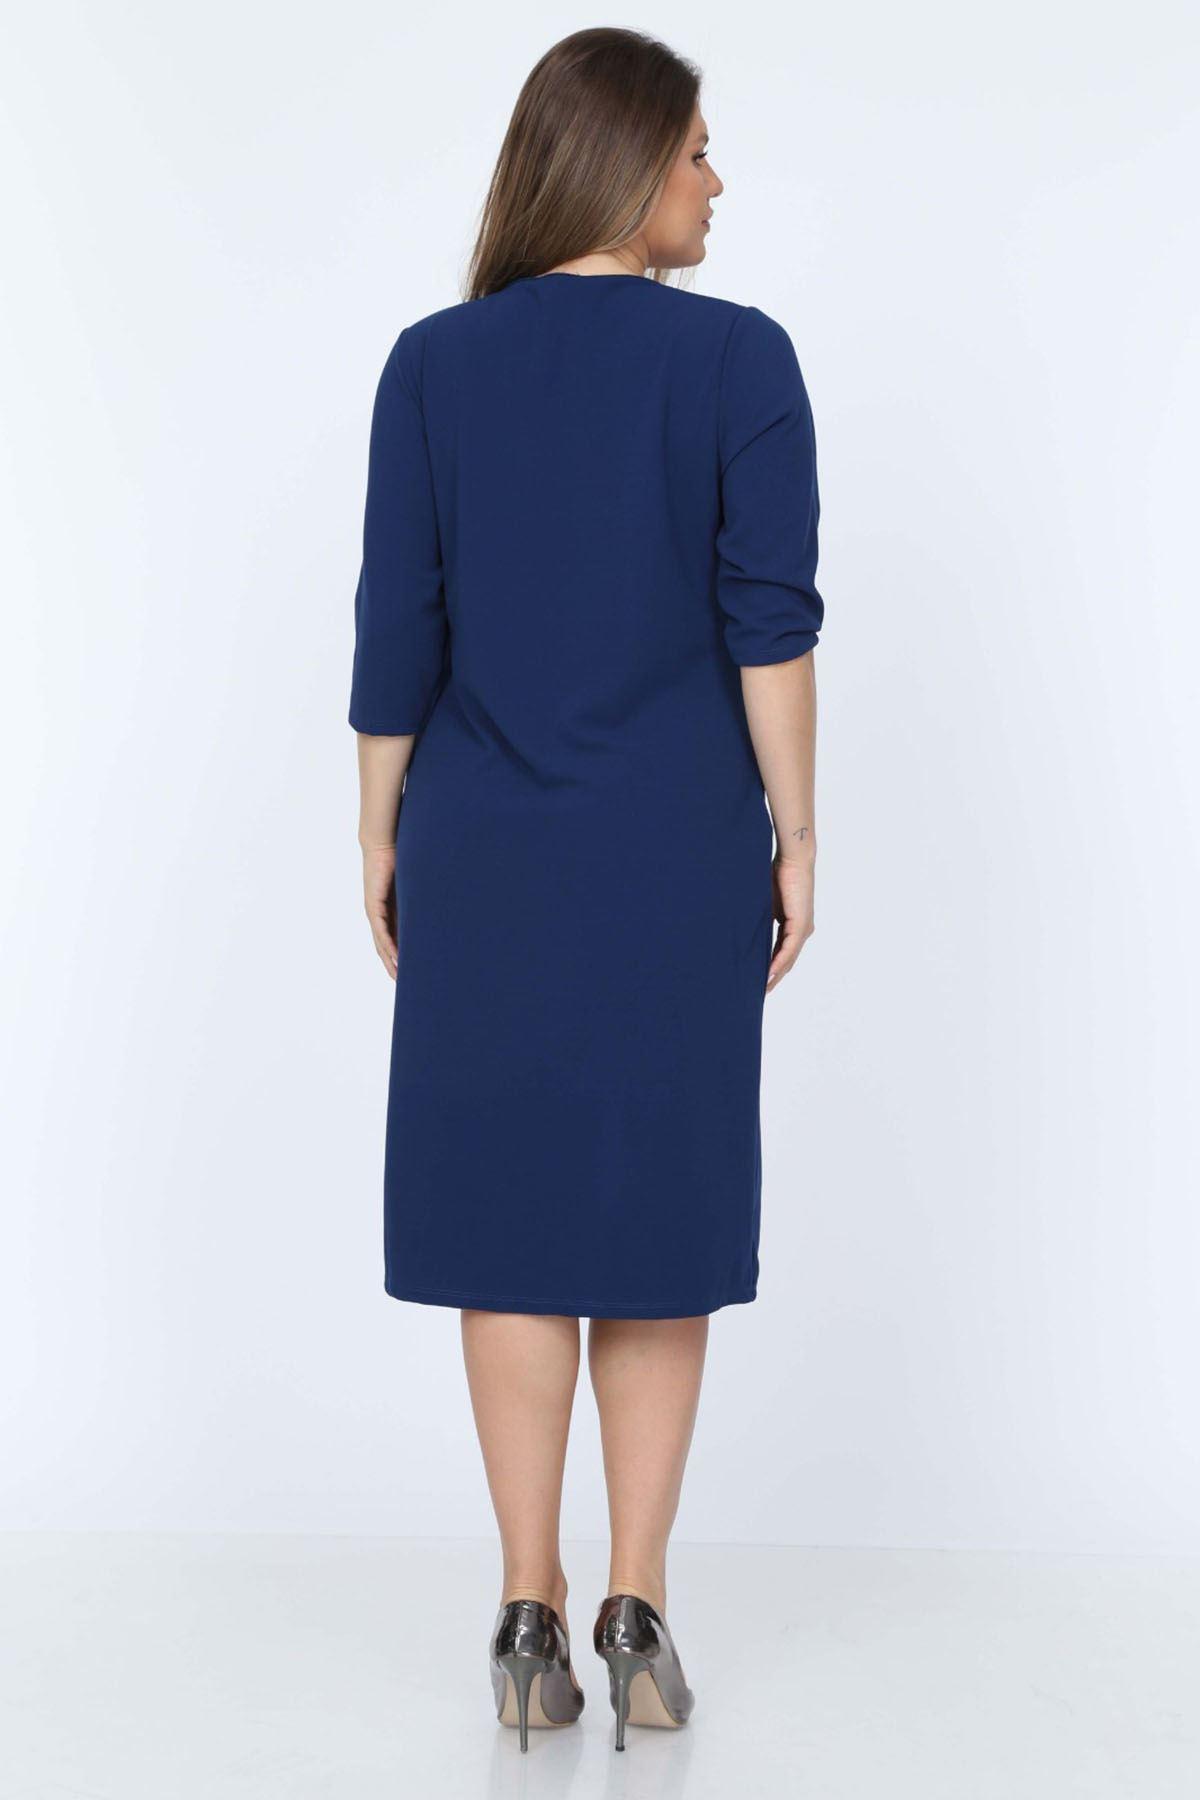 Cepli Lacivert Elbise 22C-0721